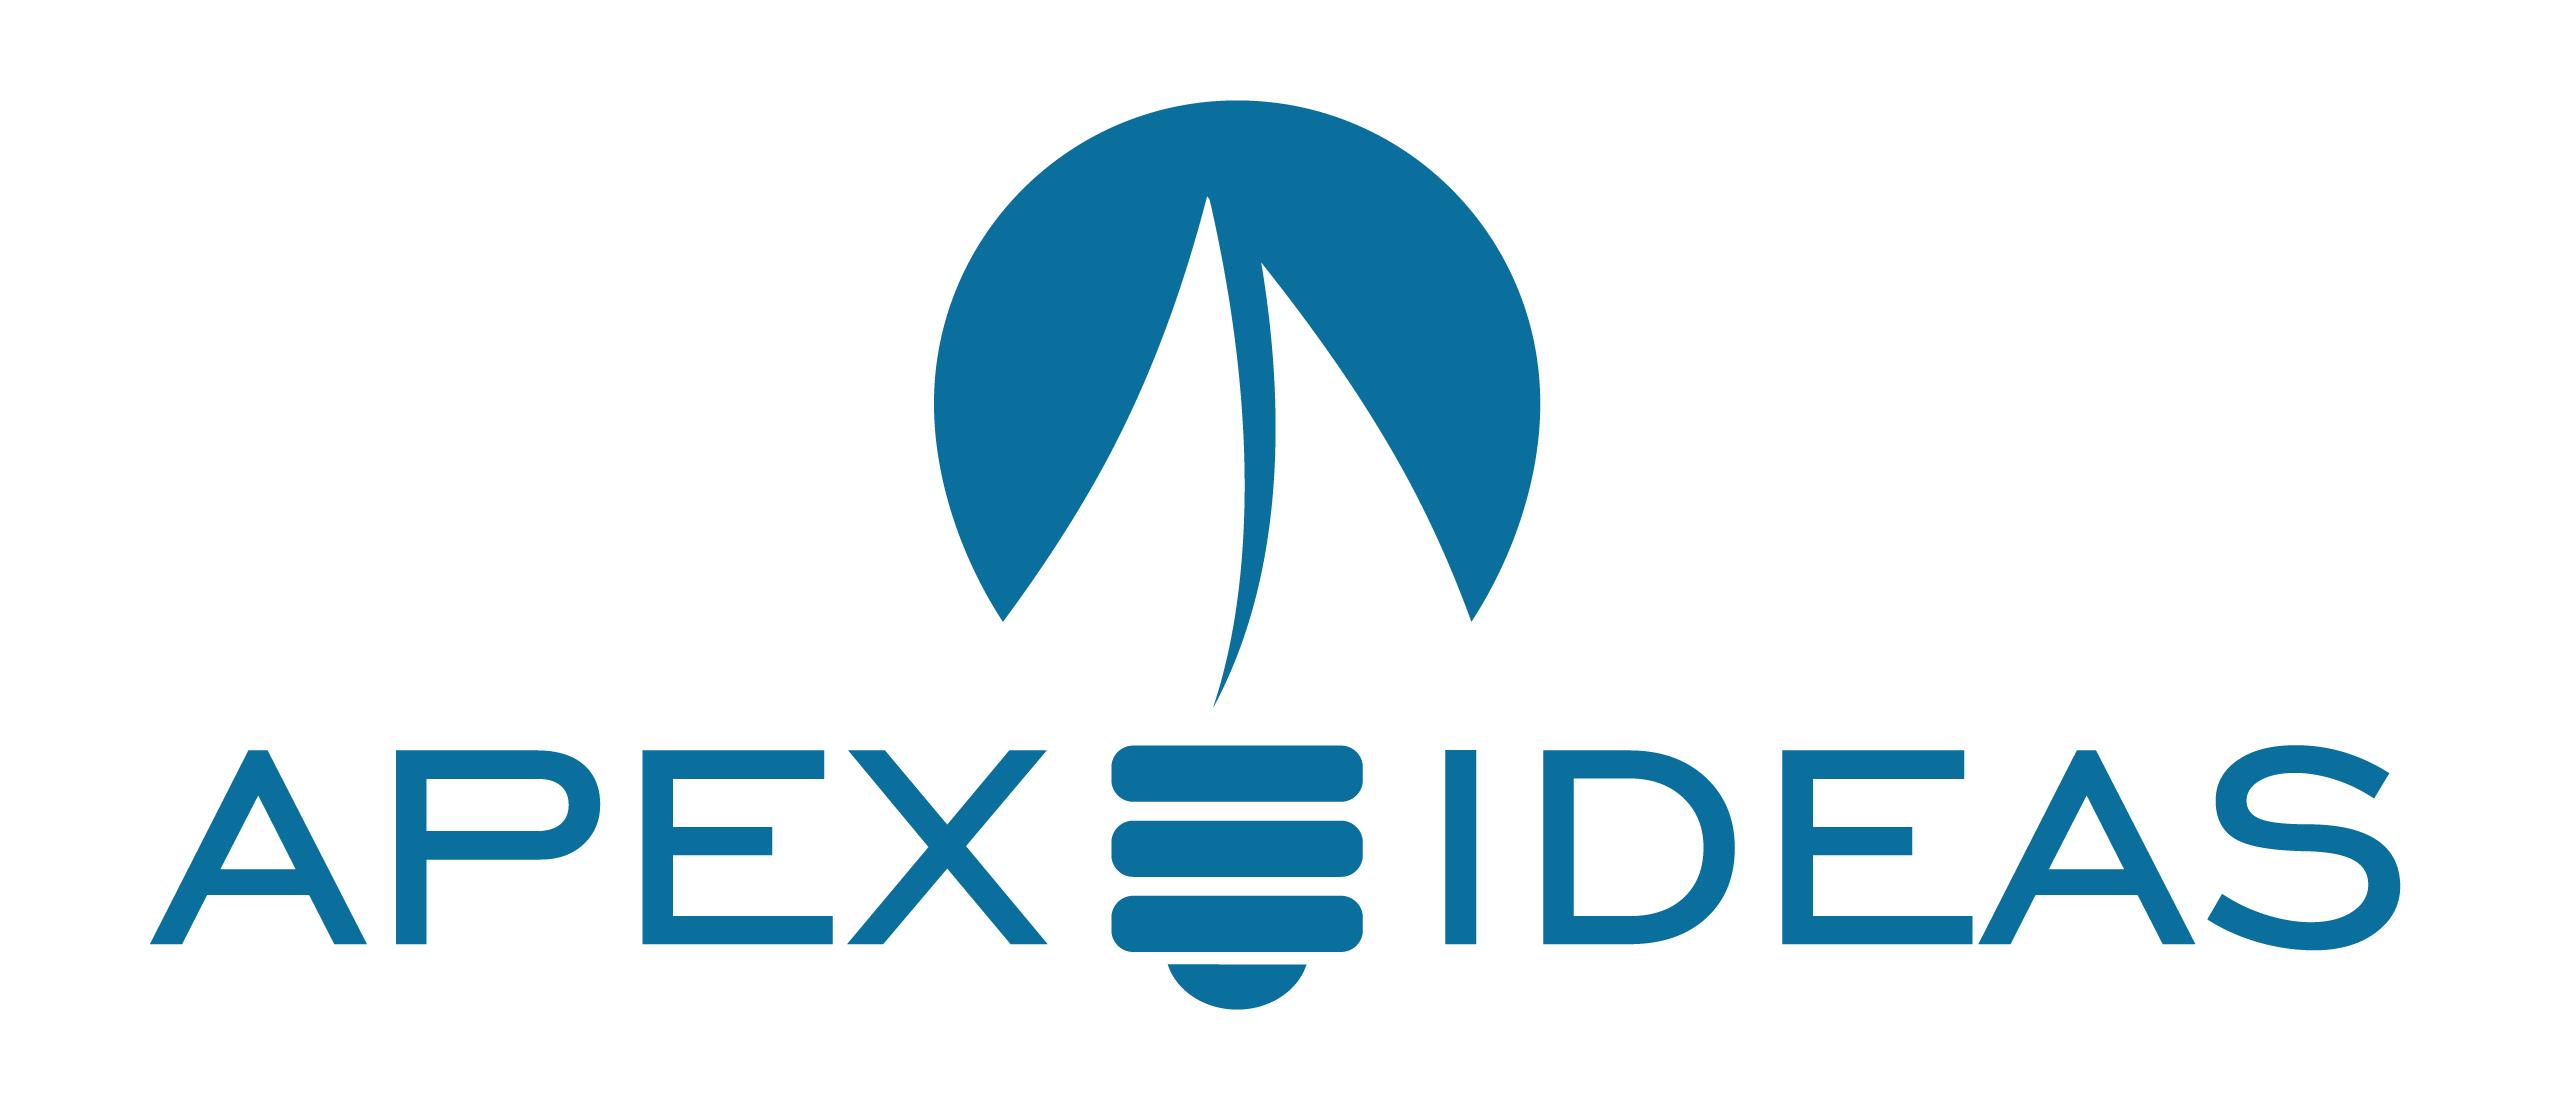 apex ideas, logos, gif,Logo designers in Islamabad